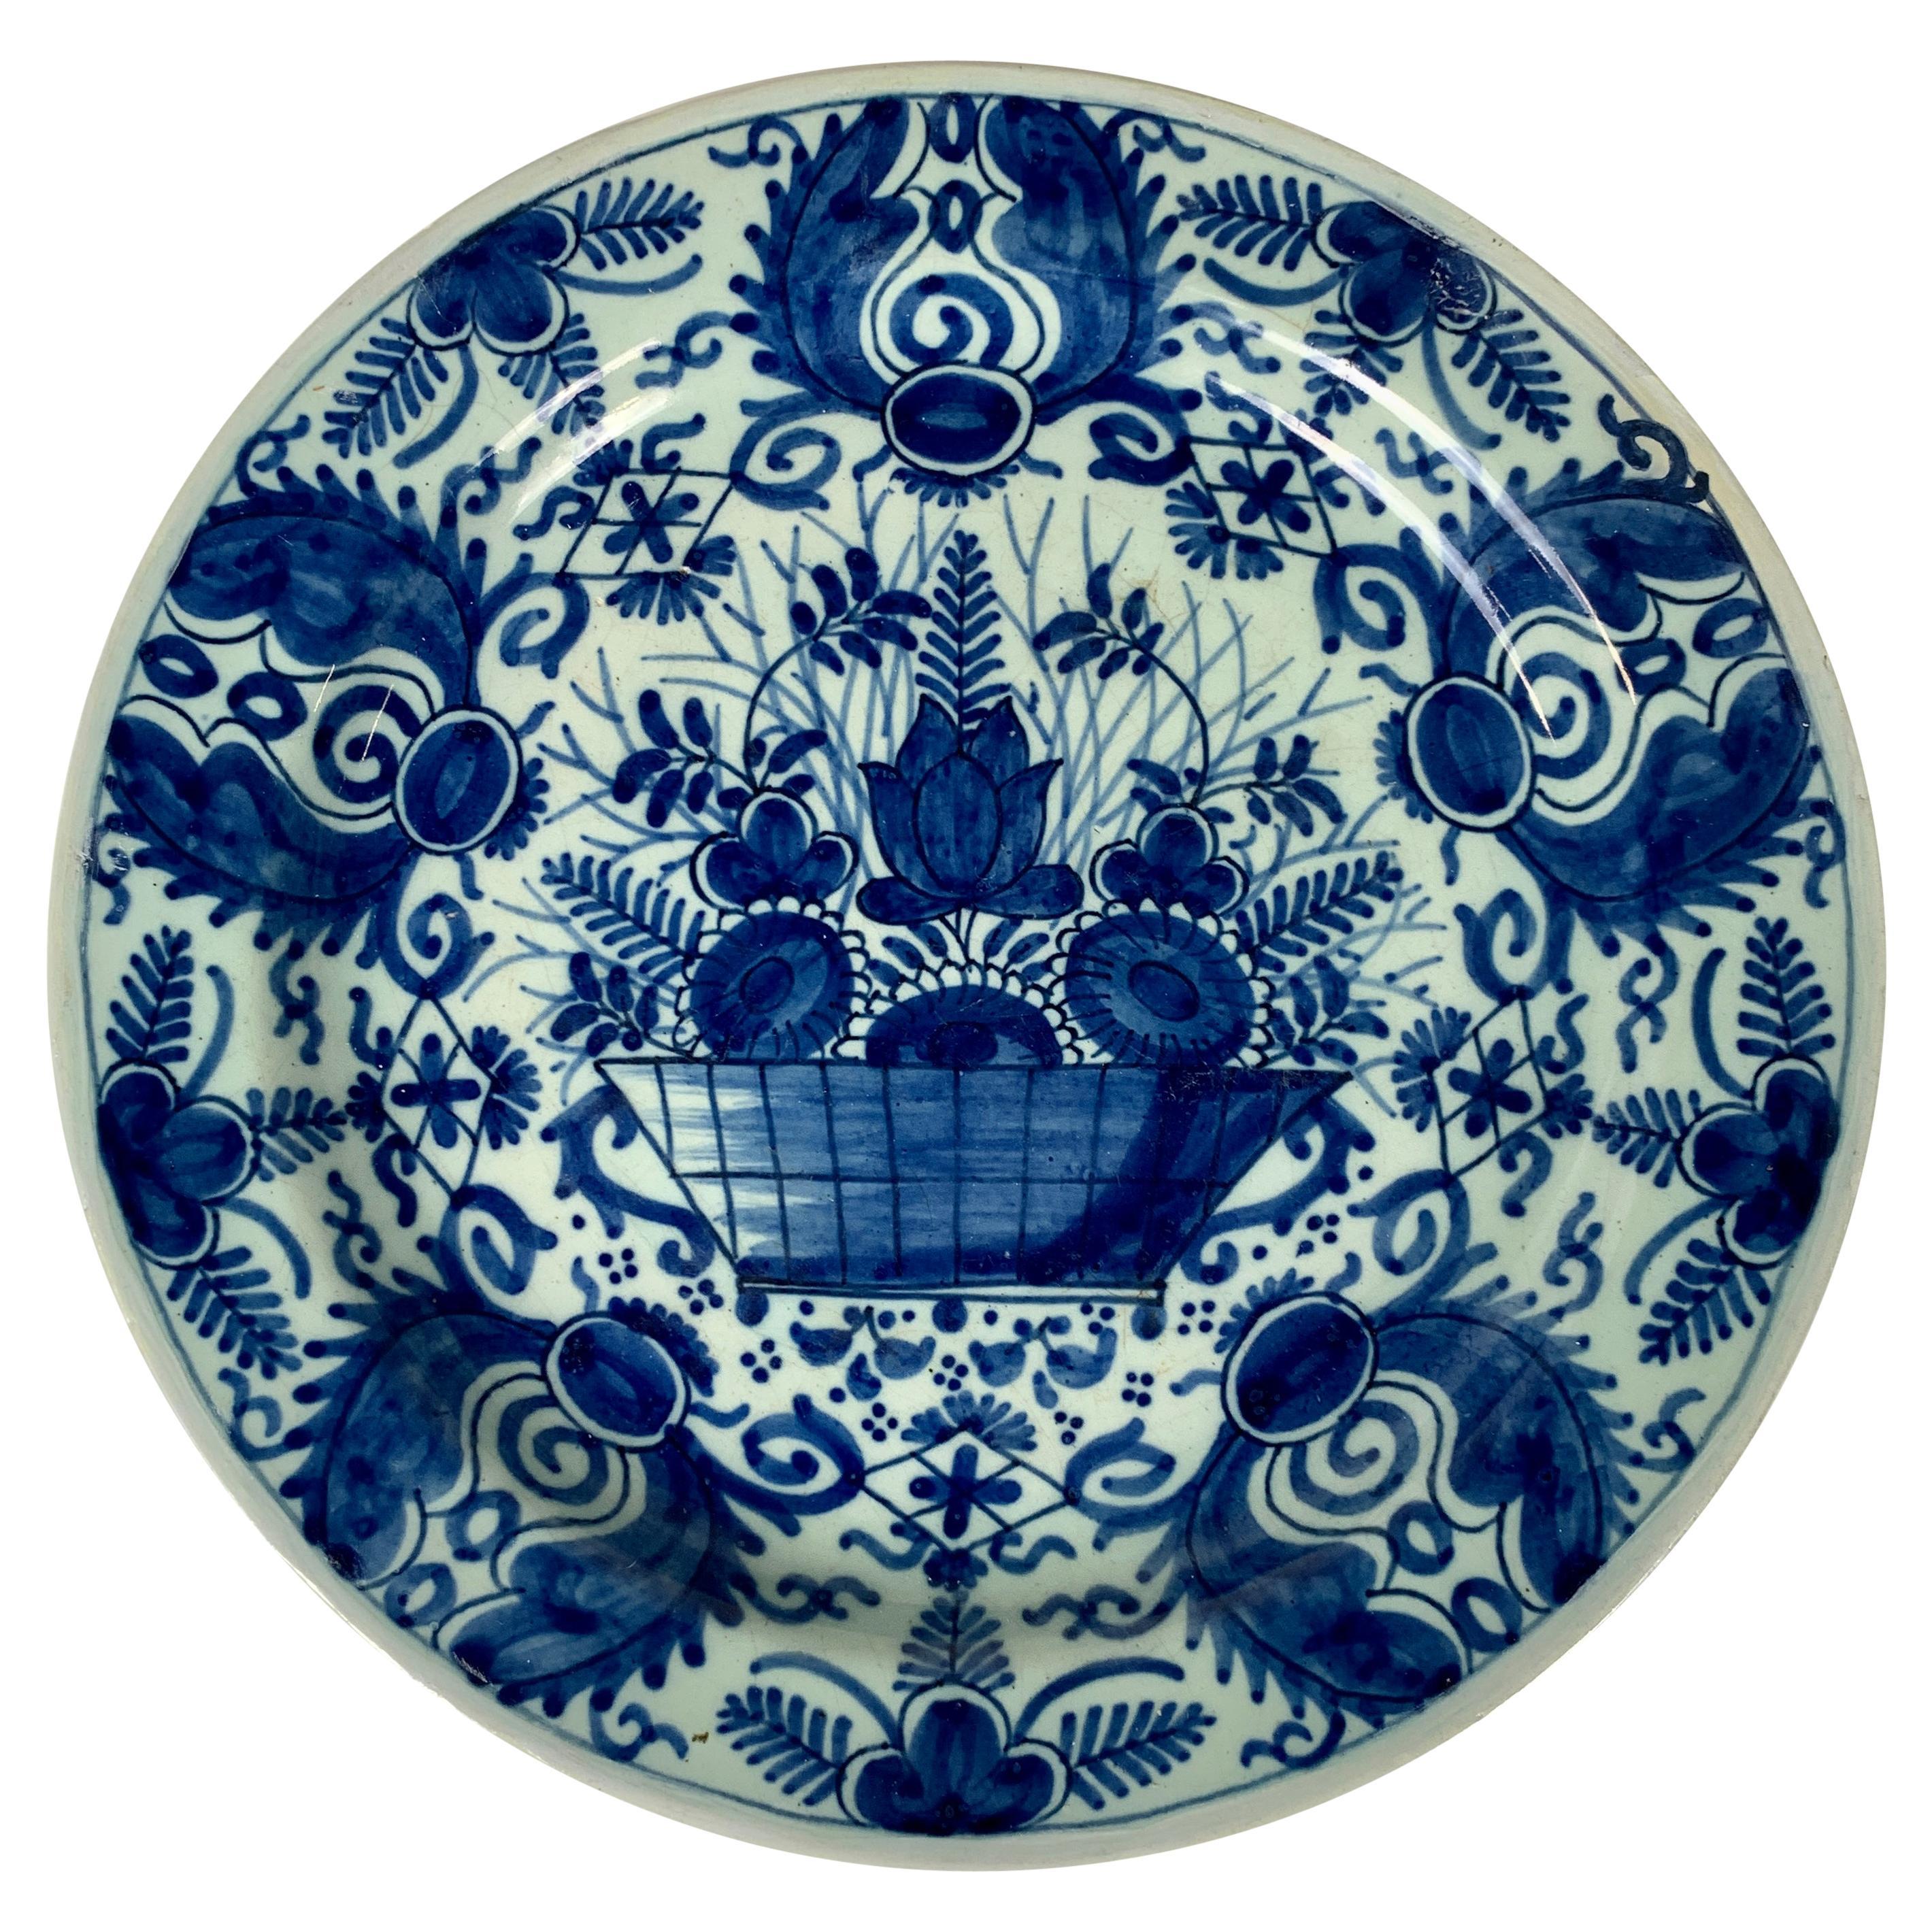 Antique Blue and White Dutch Delft Dish, 18th Century, Made c-1770